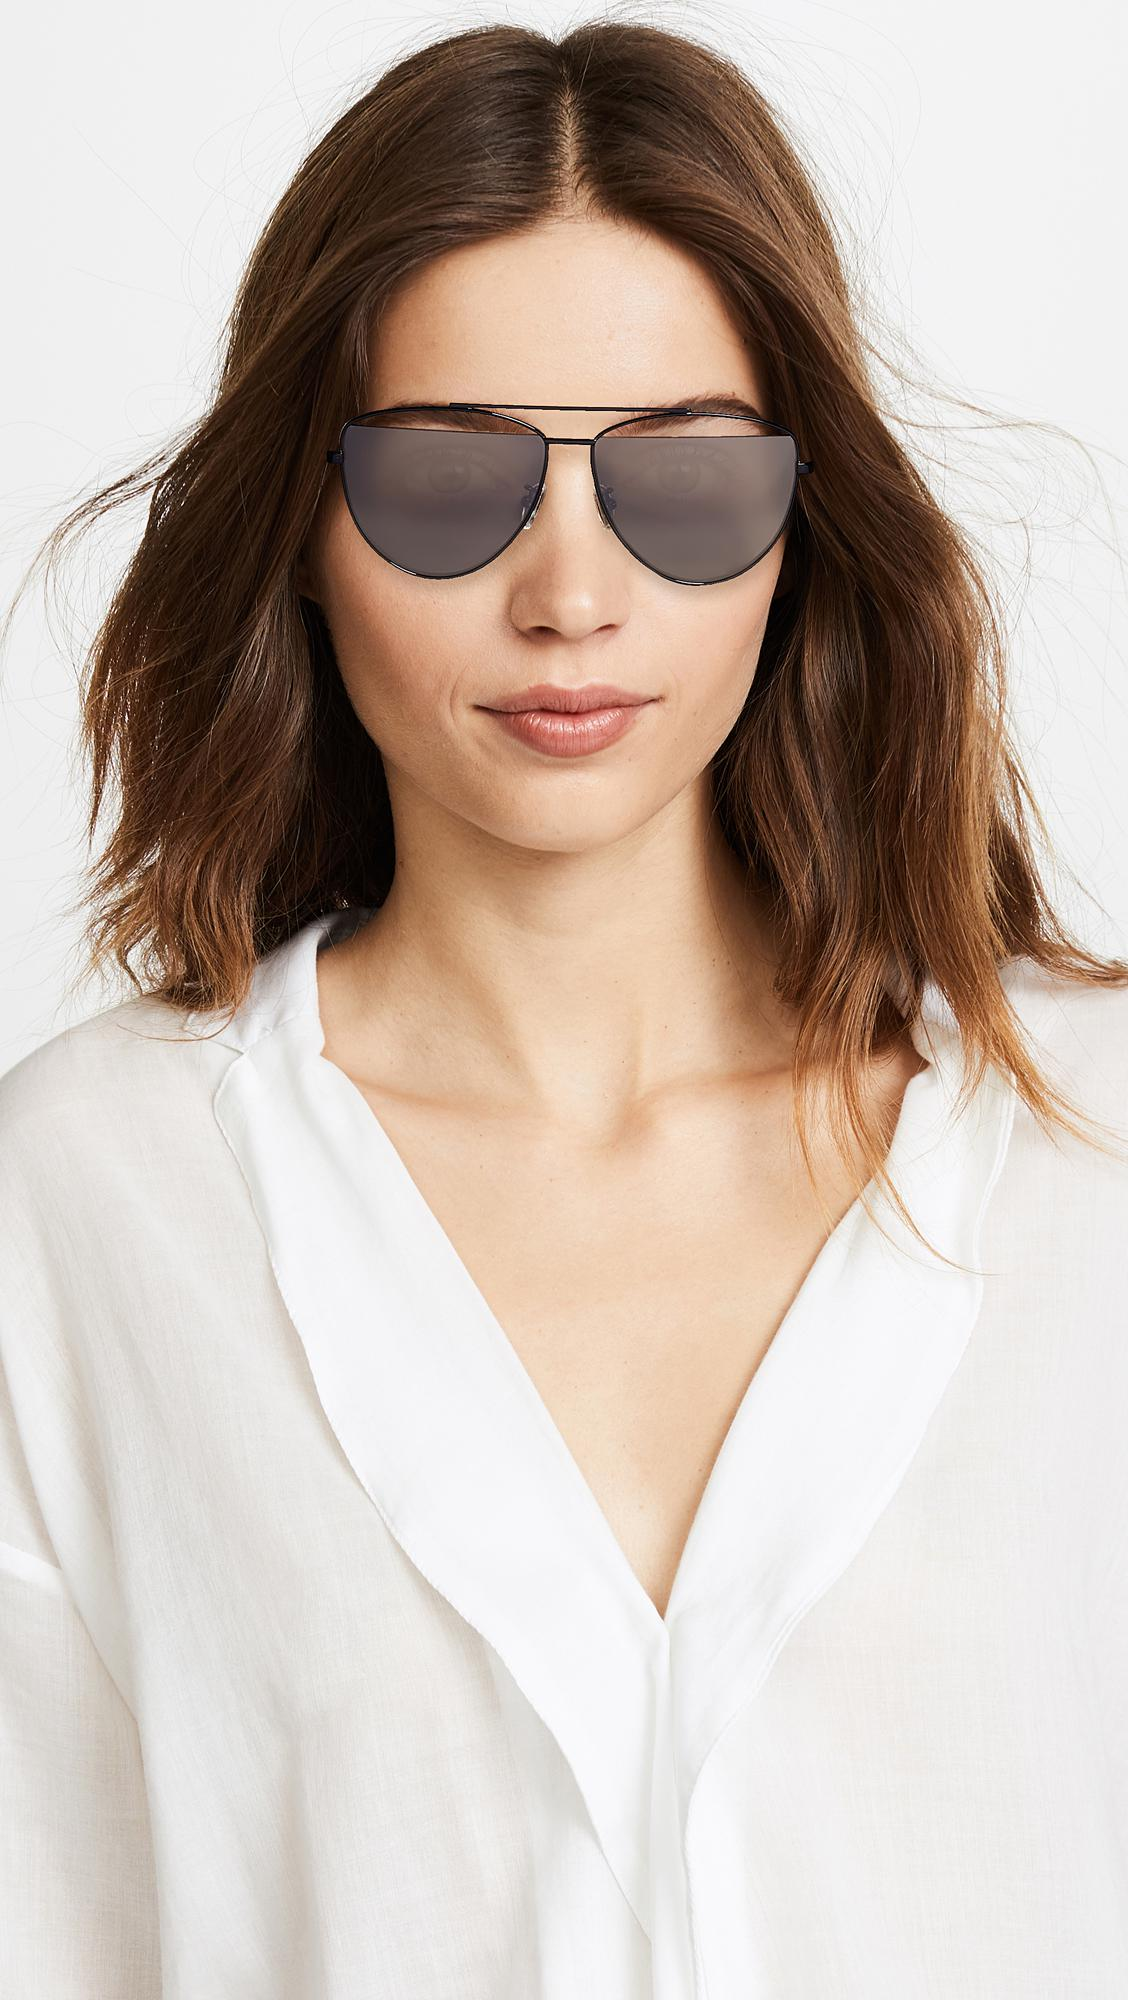 8be82d7565 McQ Alexander McQueen - Gray Iconic Pilot Frame Sunglasses - Lyst. View  fullscreen